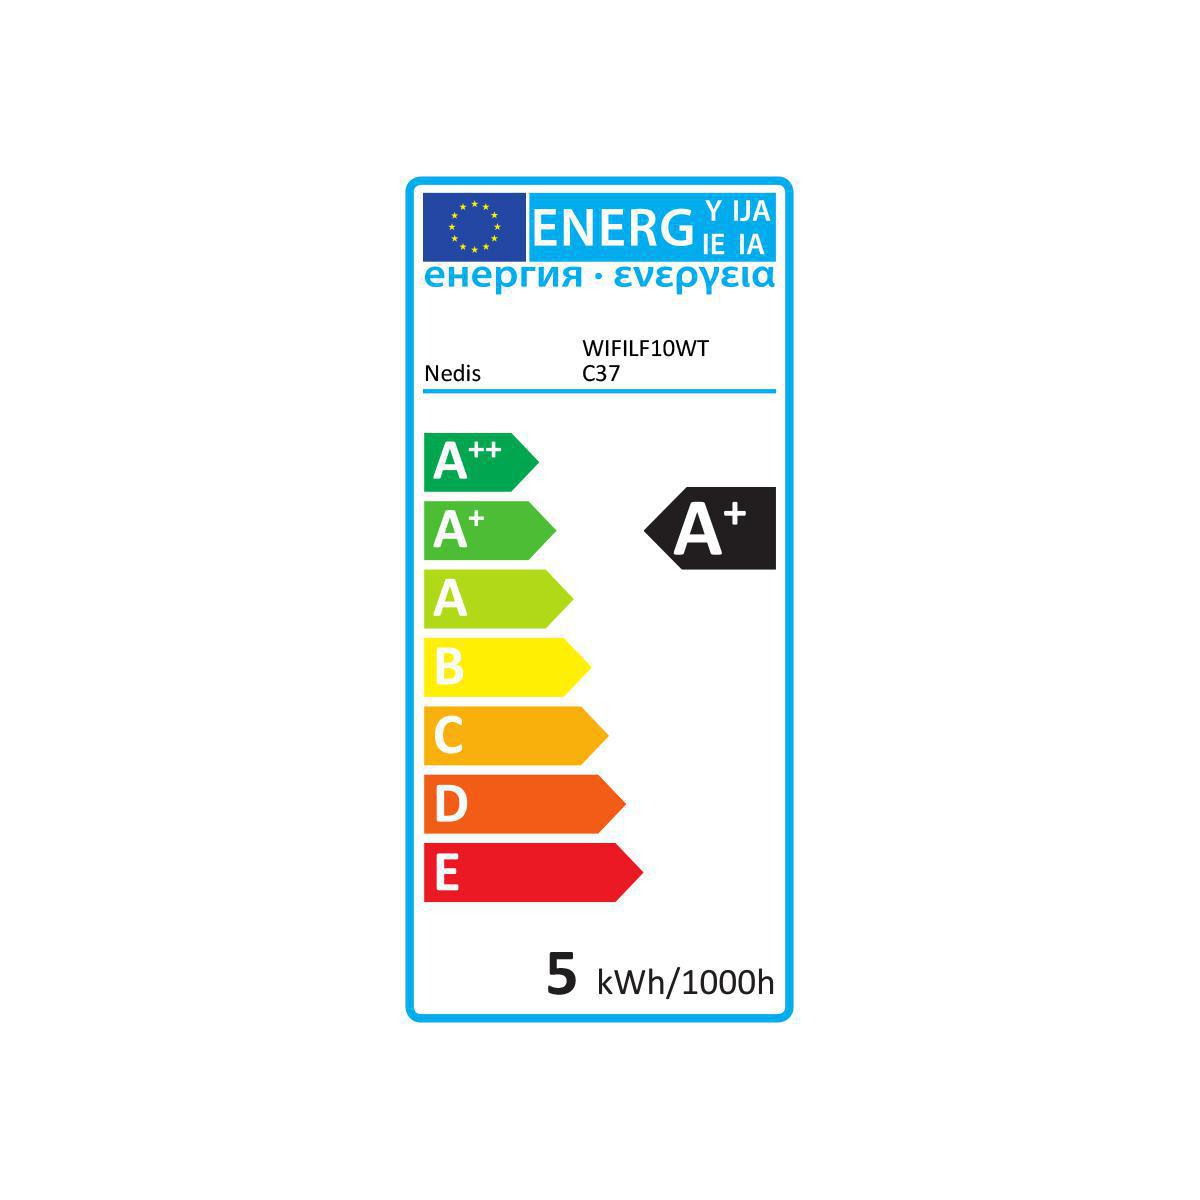 Slimme Led Lamp E14 fitting 2700K - Warm wit - energielabel